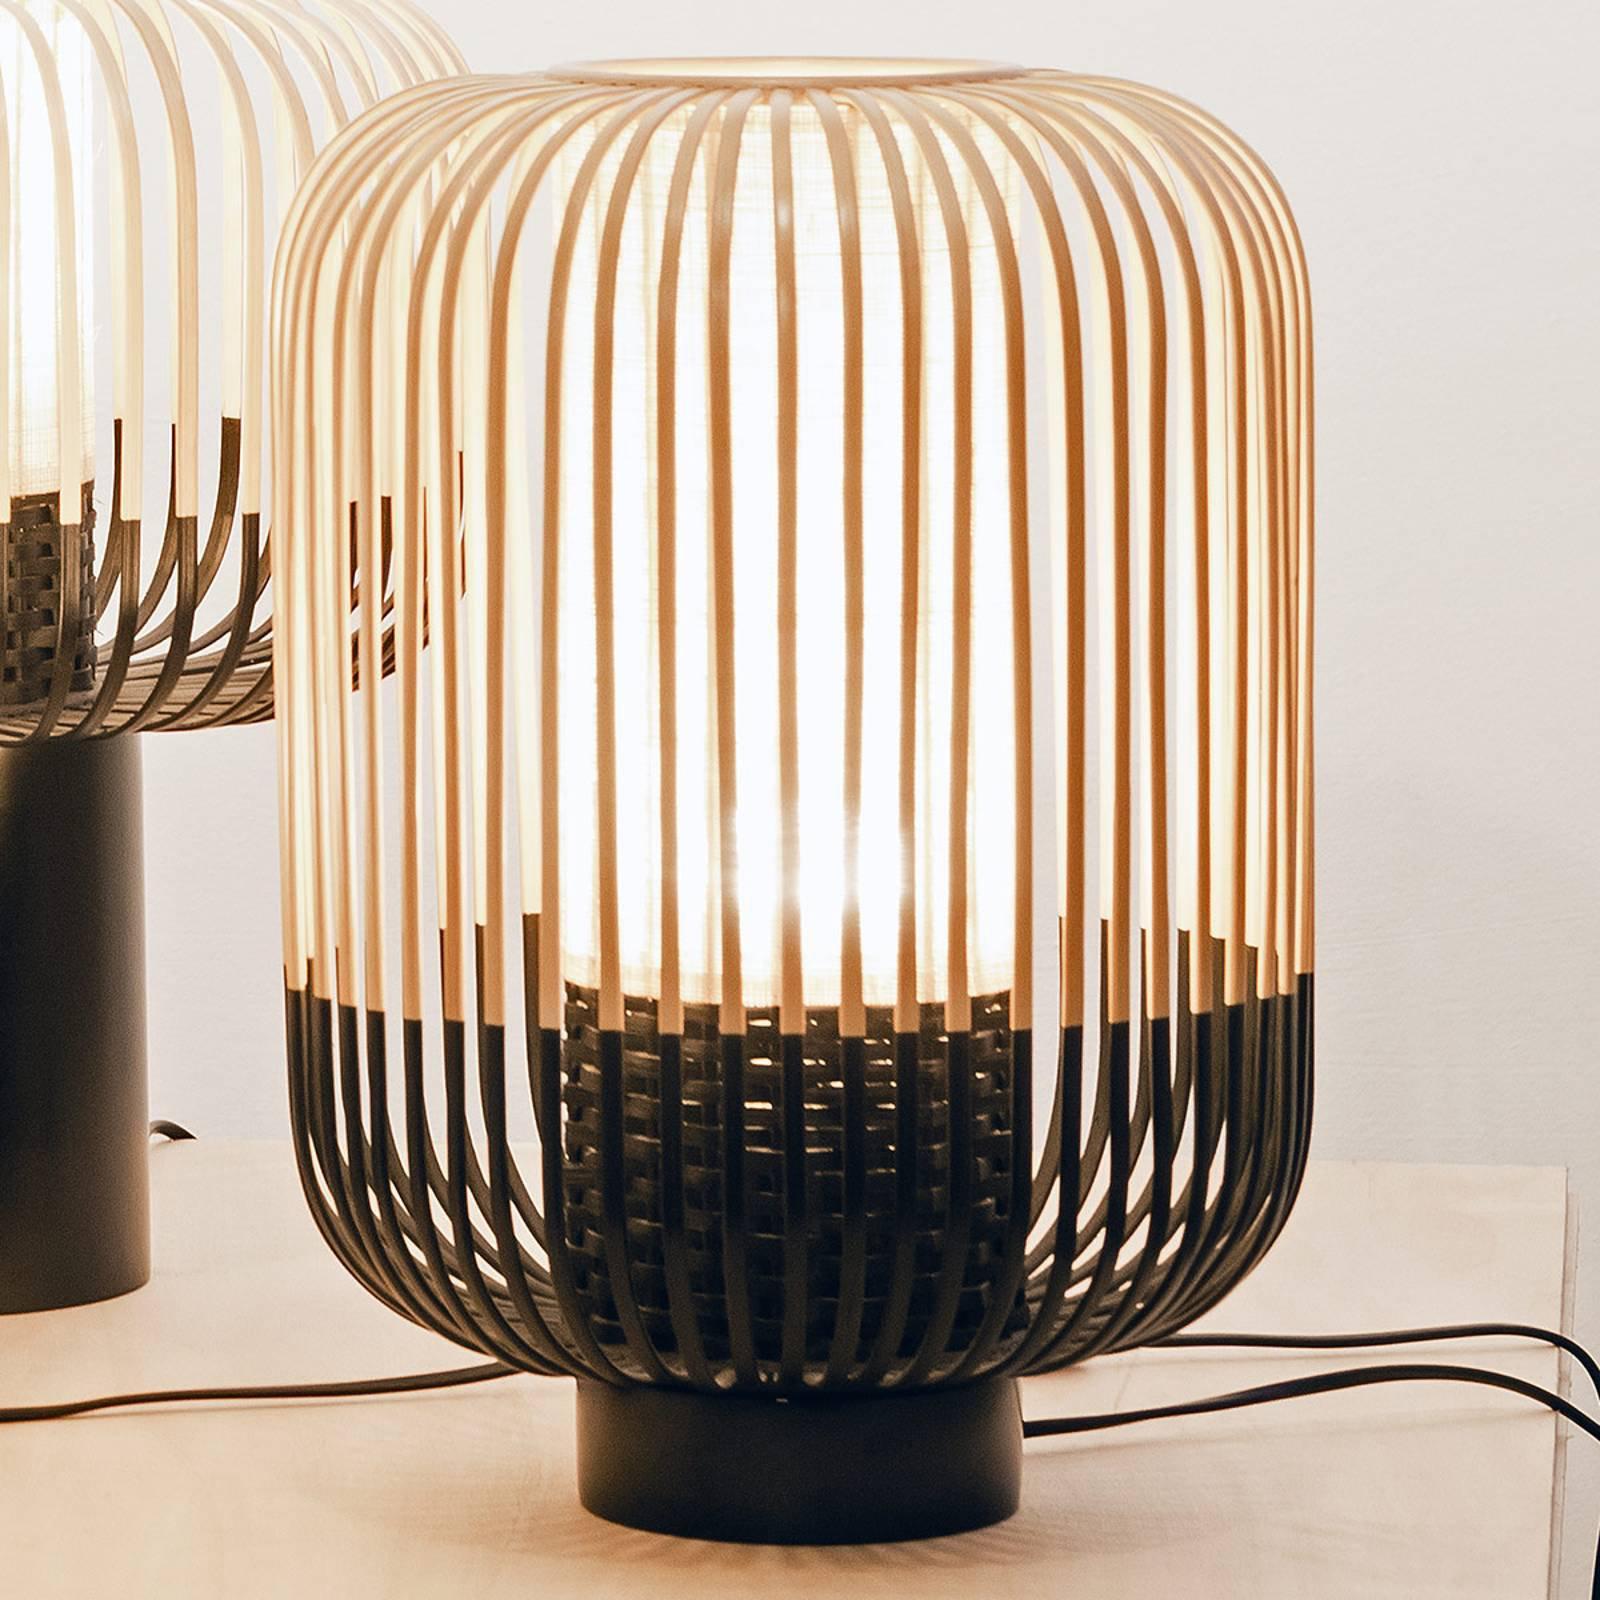 Forestier Bamboo Light M bordlampe, 39 cm, svart